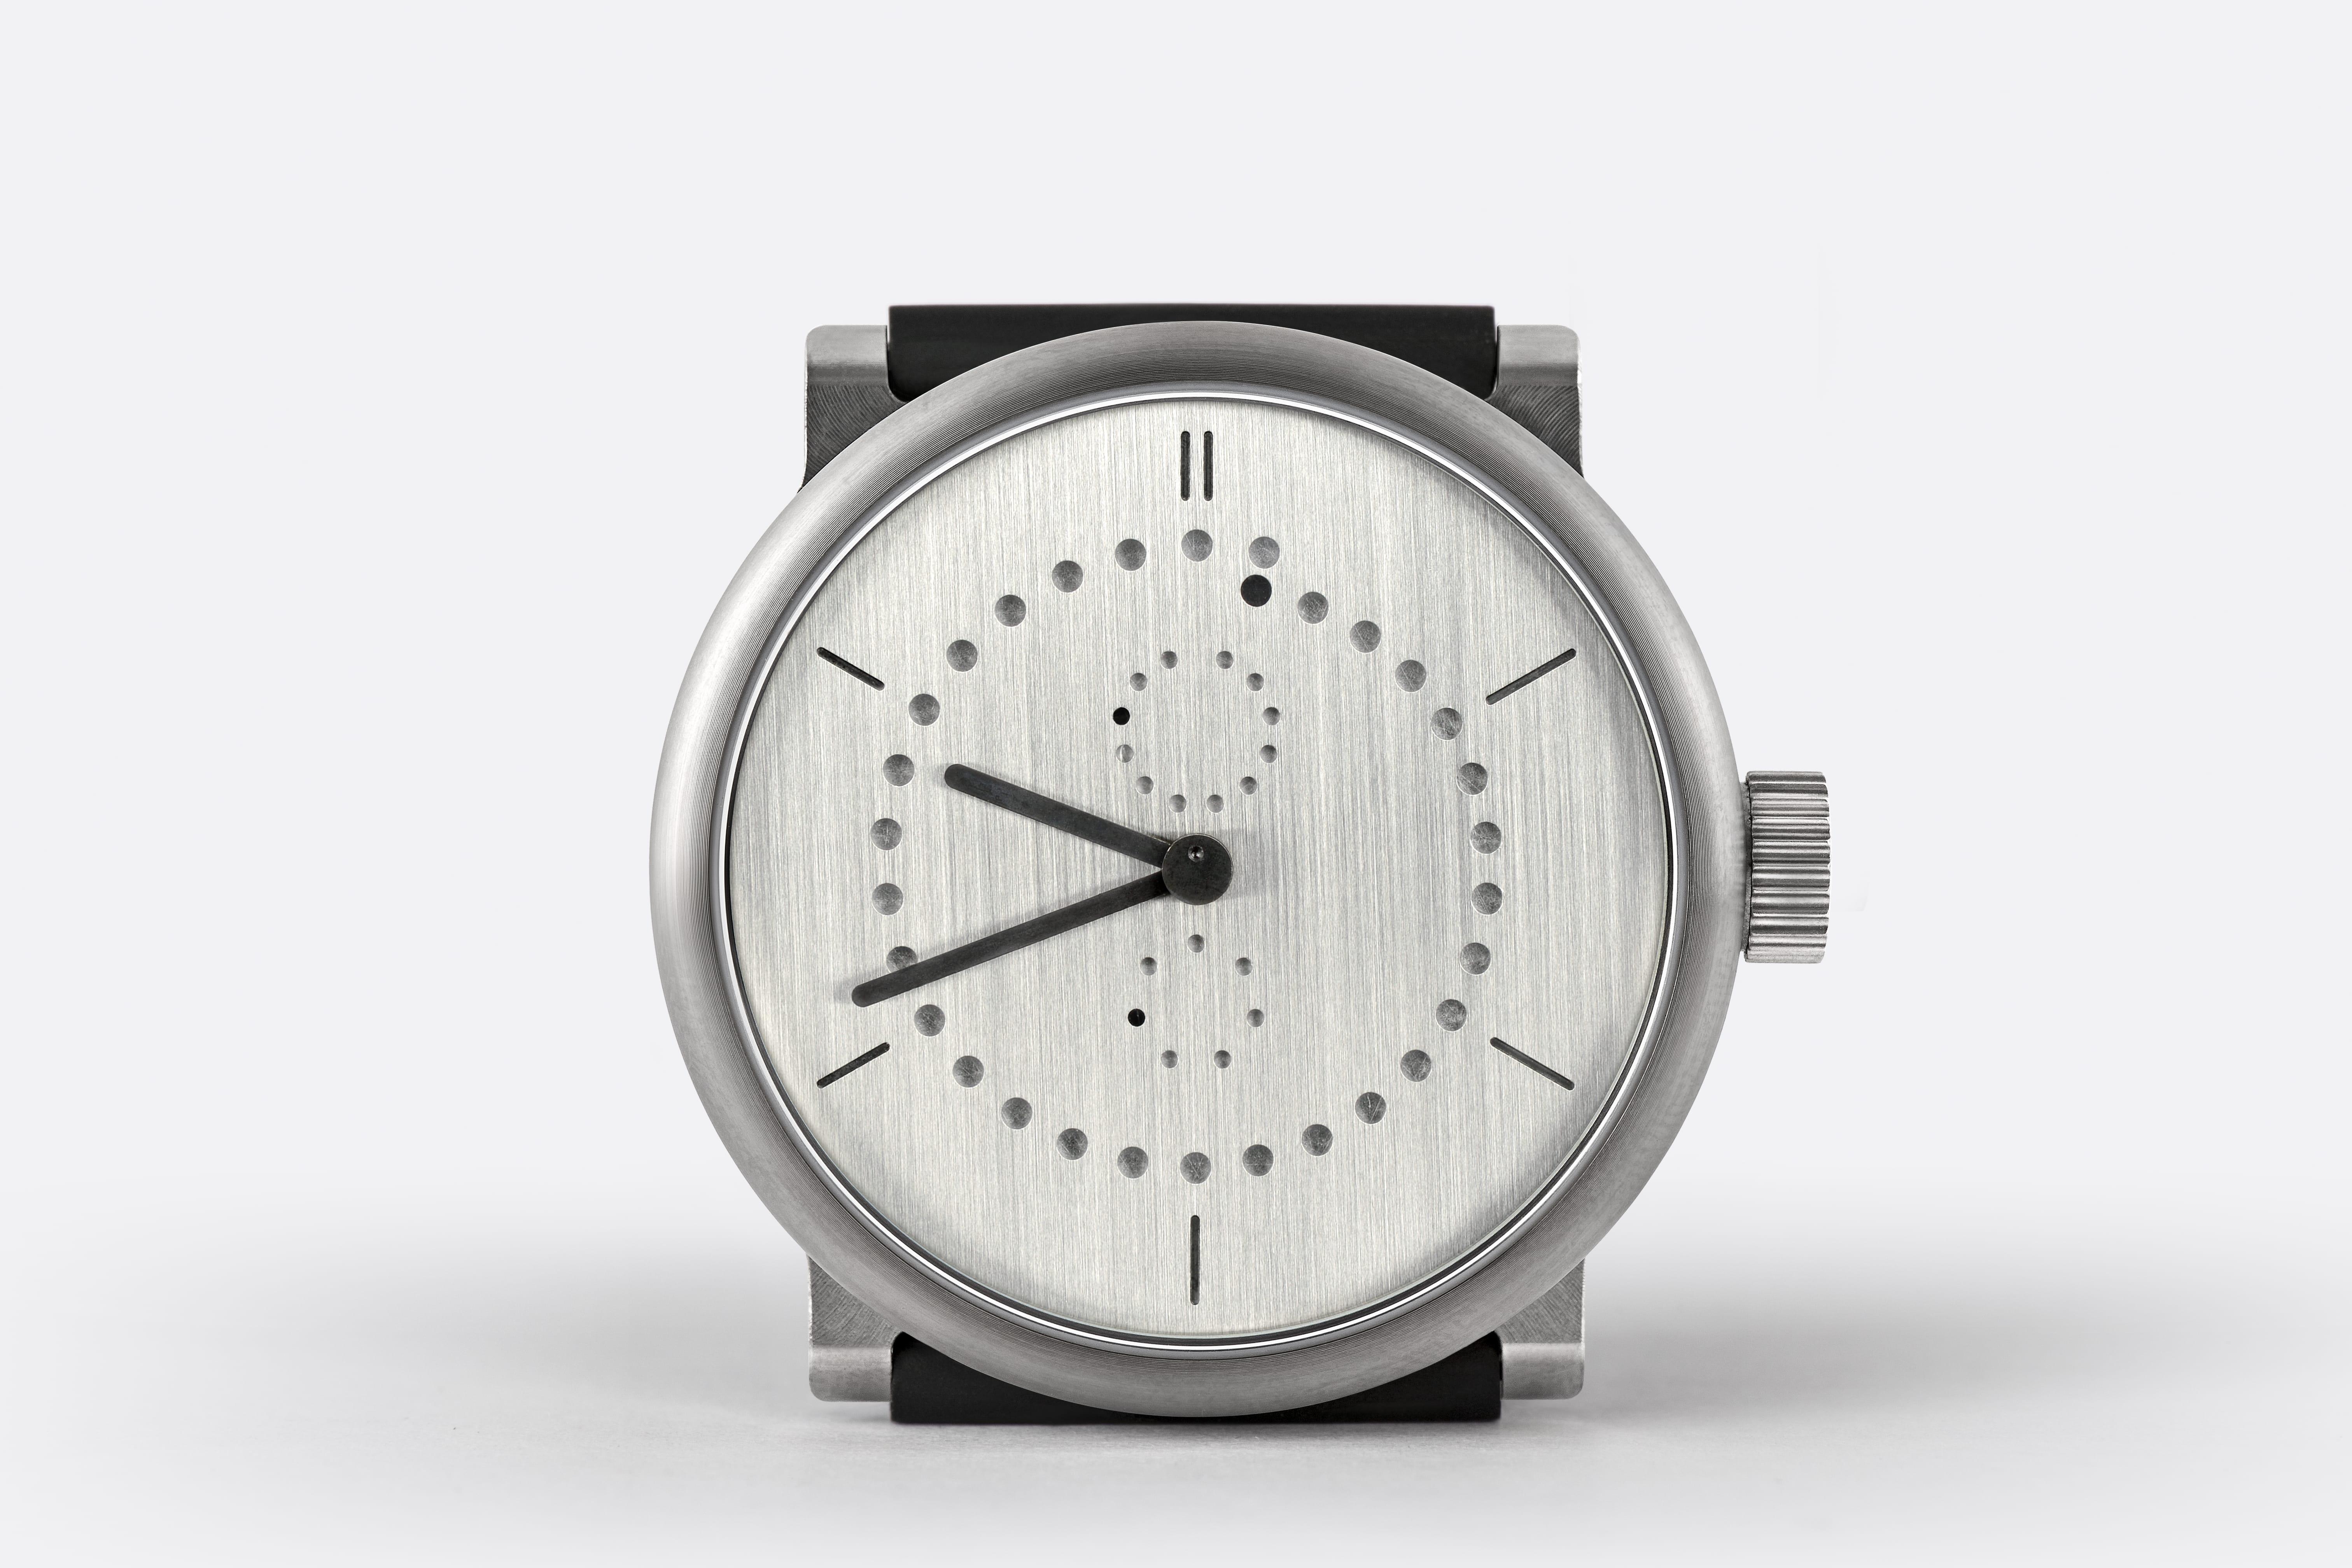 annual-calendar-watch-german-silver-39mm-ochs-und-junior-March-1st_G